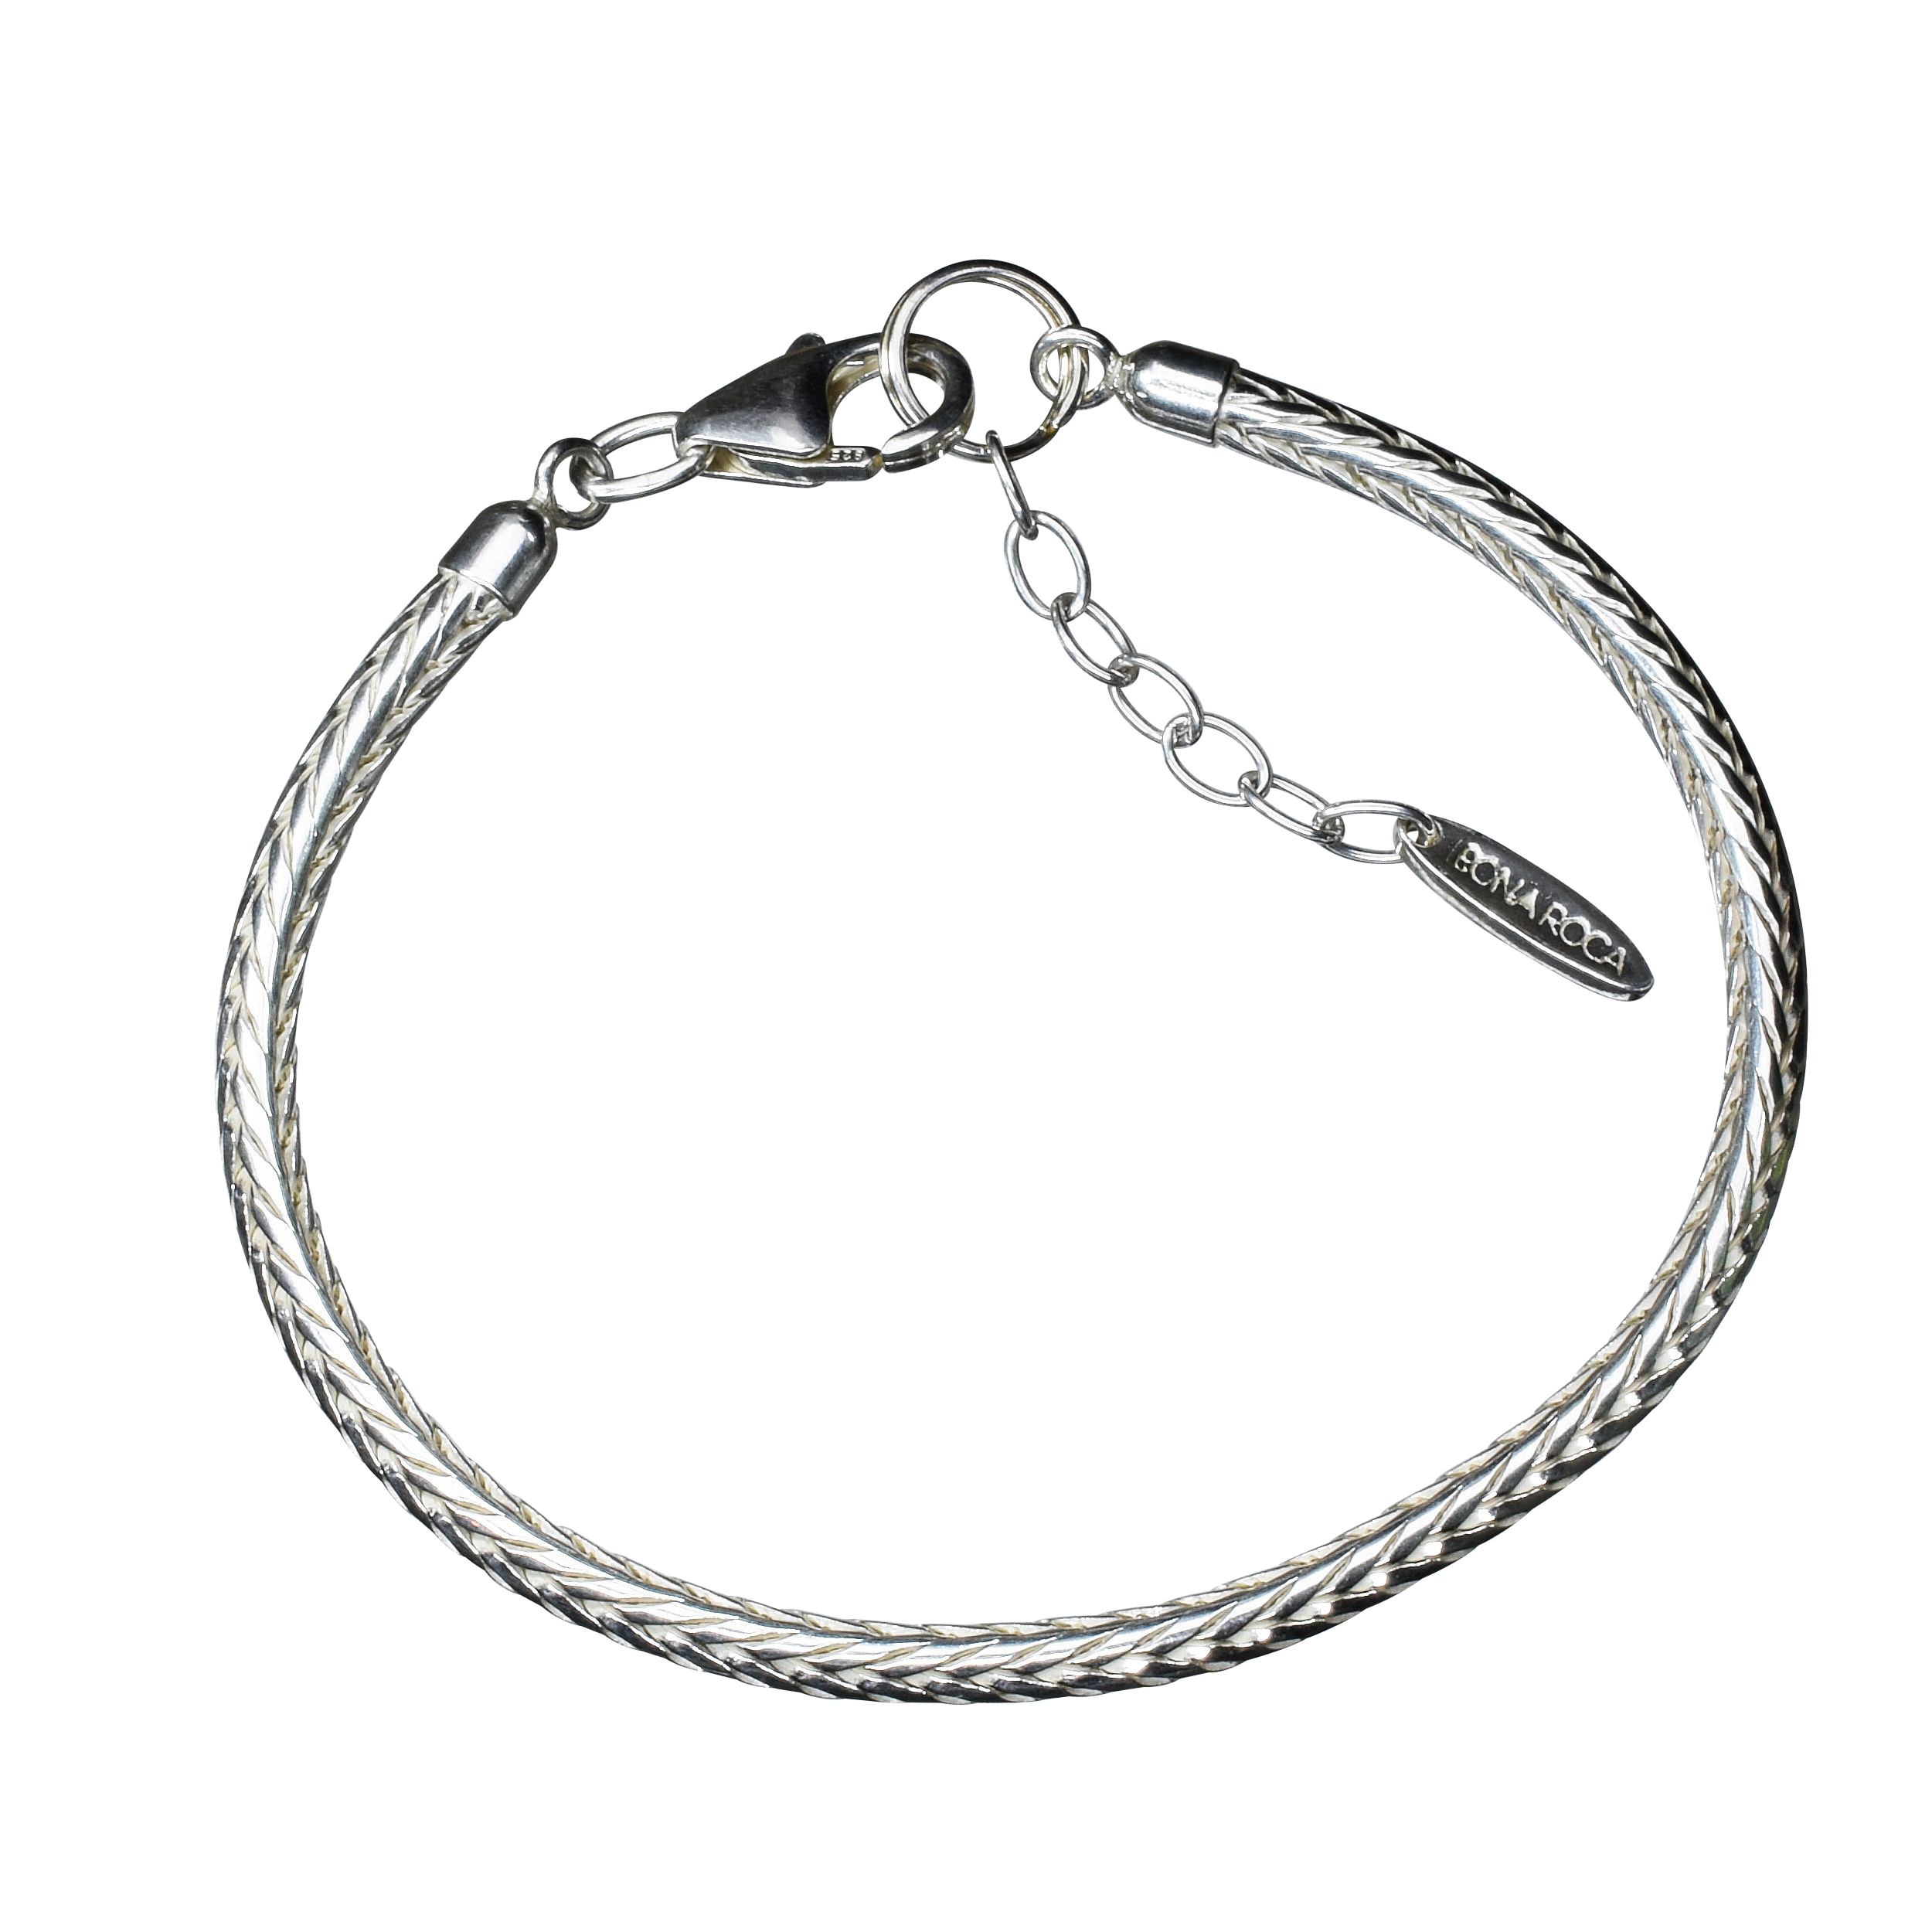 Silber Armband-Kette (Promo -25%/ Code NK2021)